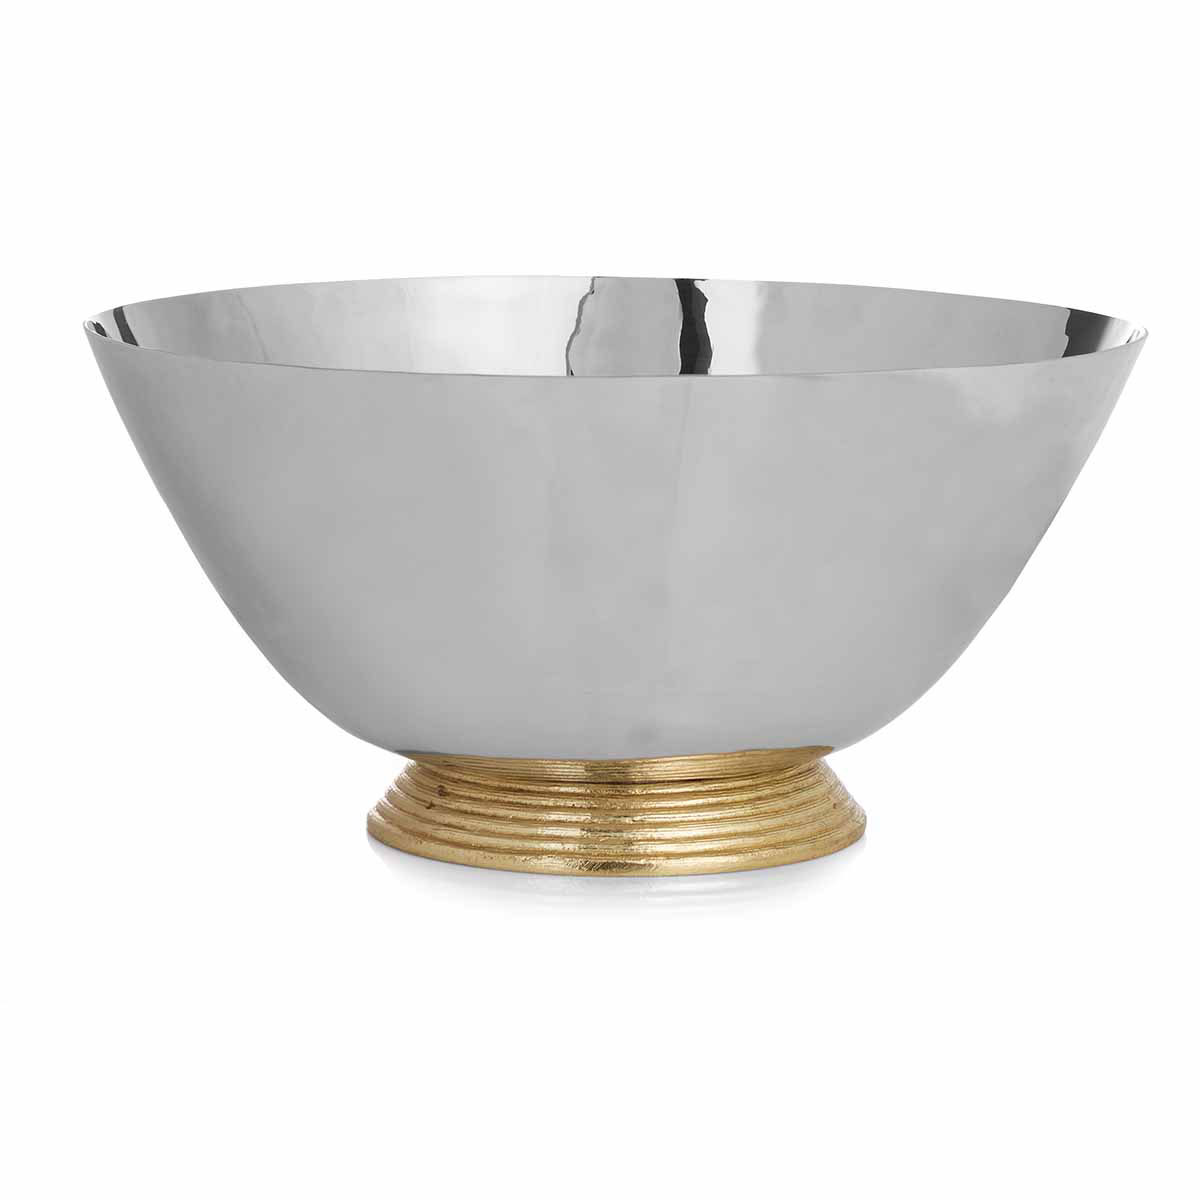 Michael Aram Wheat Bowl, Large